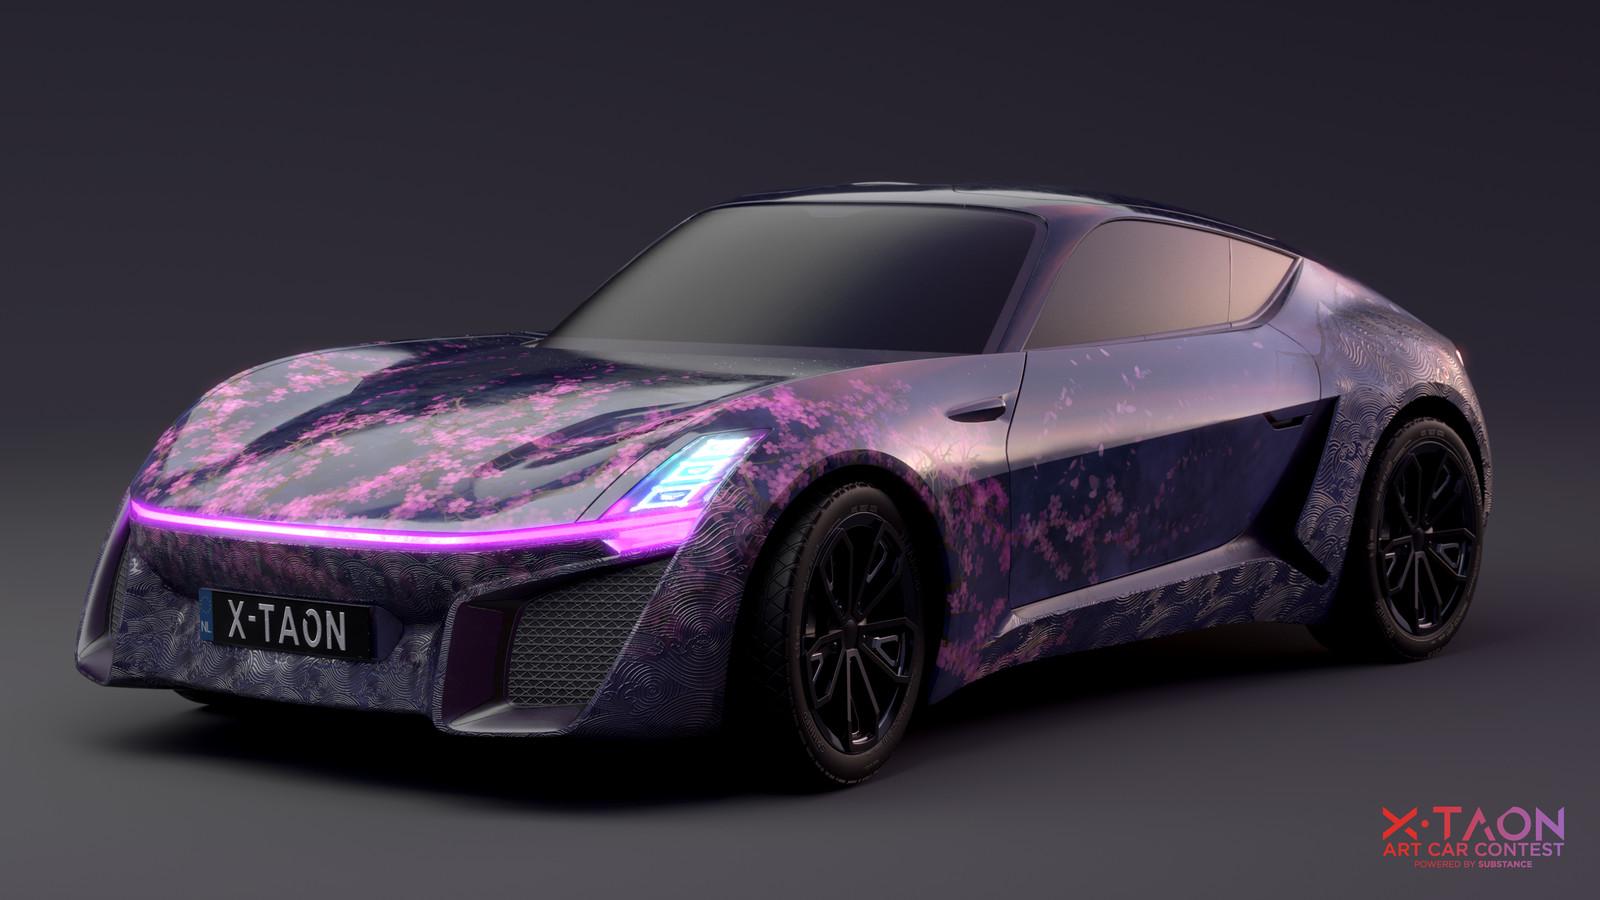 Substance painter X-Taon  art car contest